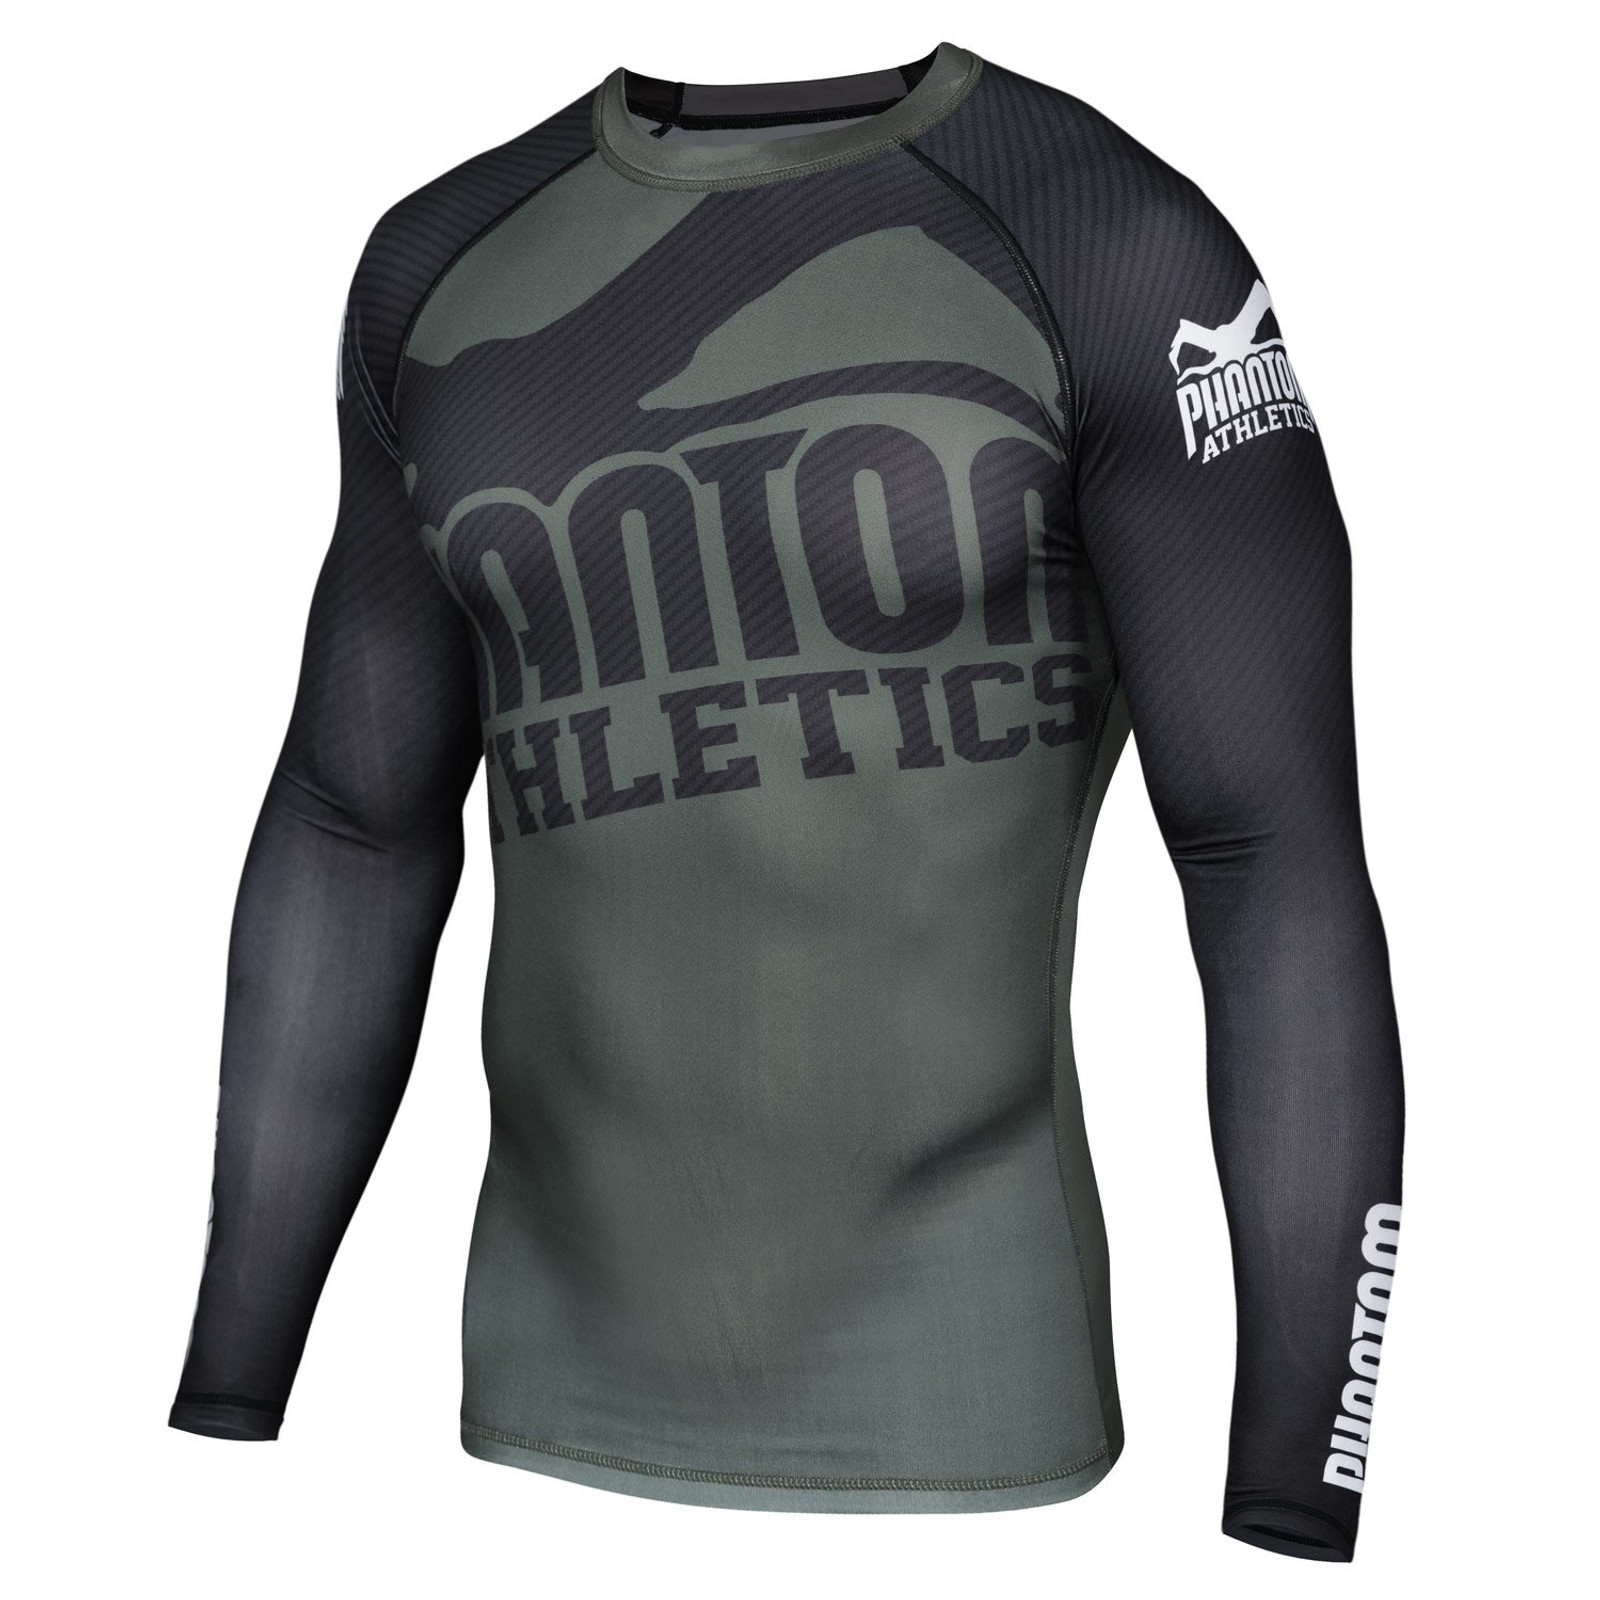 Phantom Athletics Langarm Kompressionsshirt Supporter